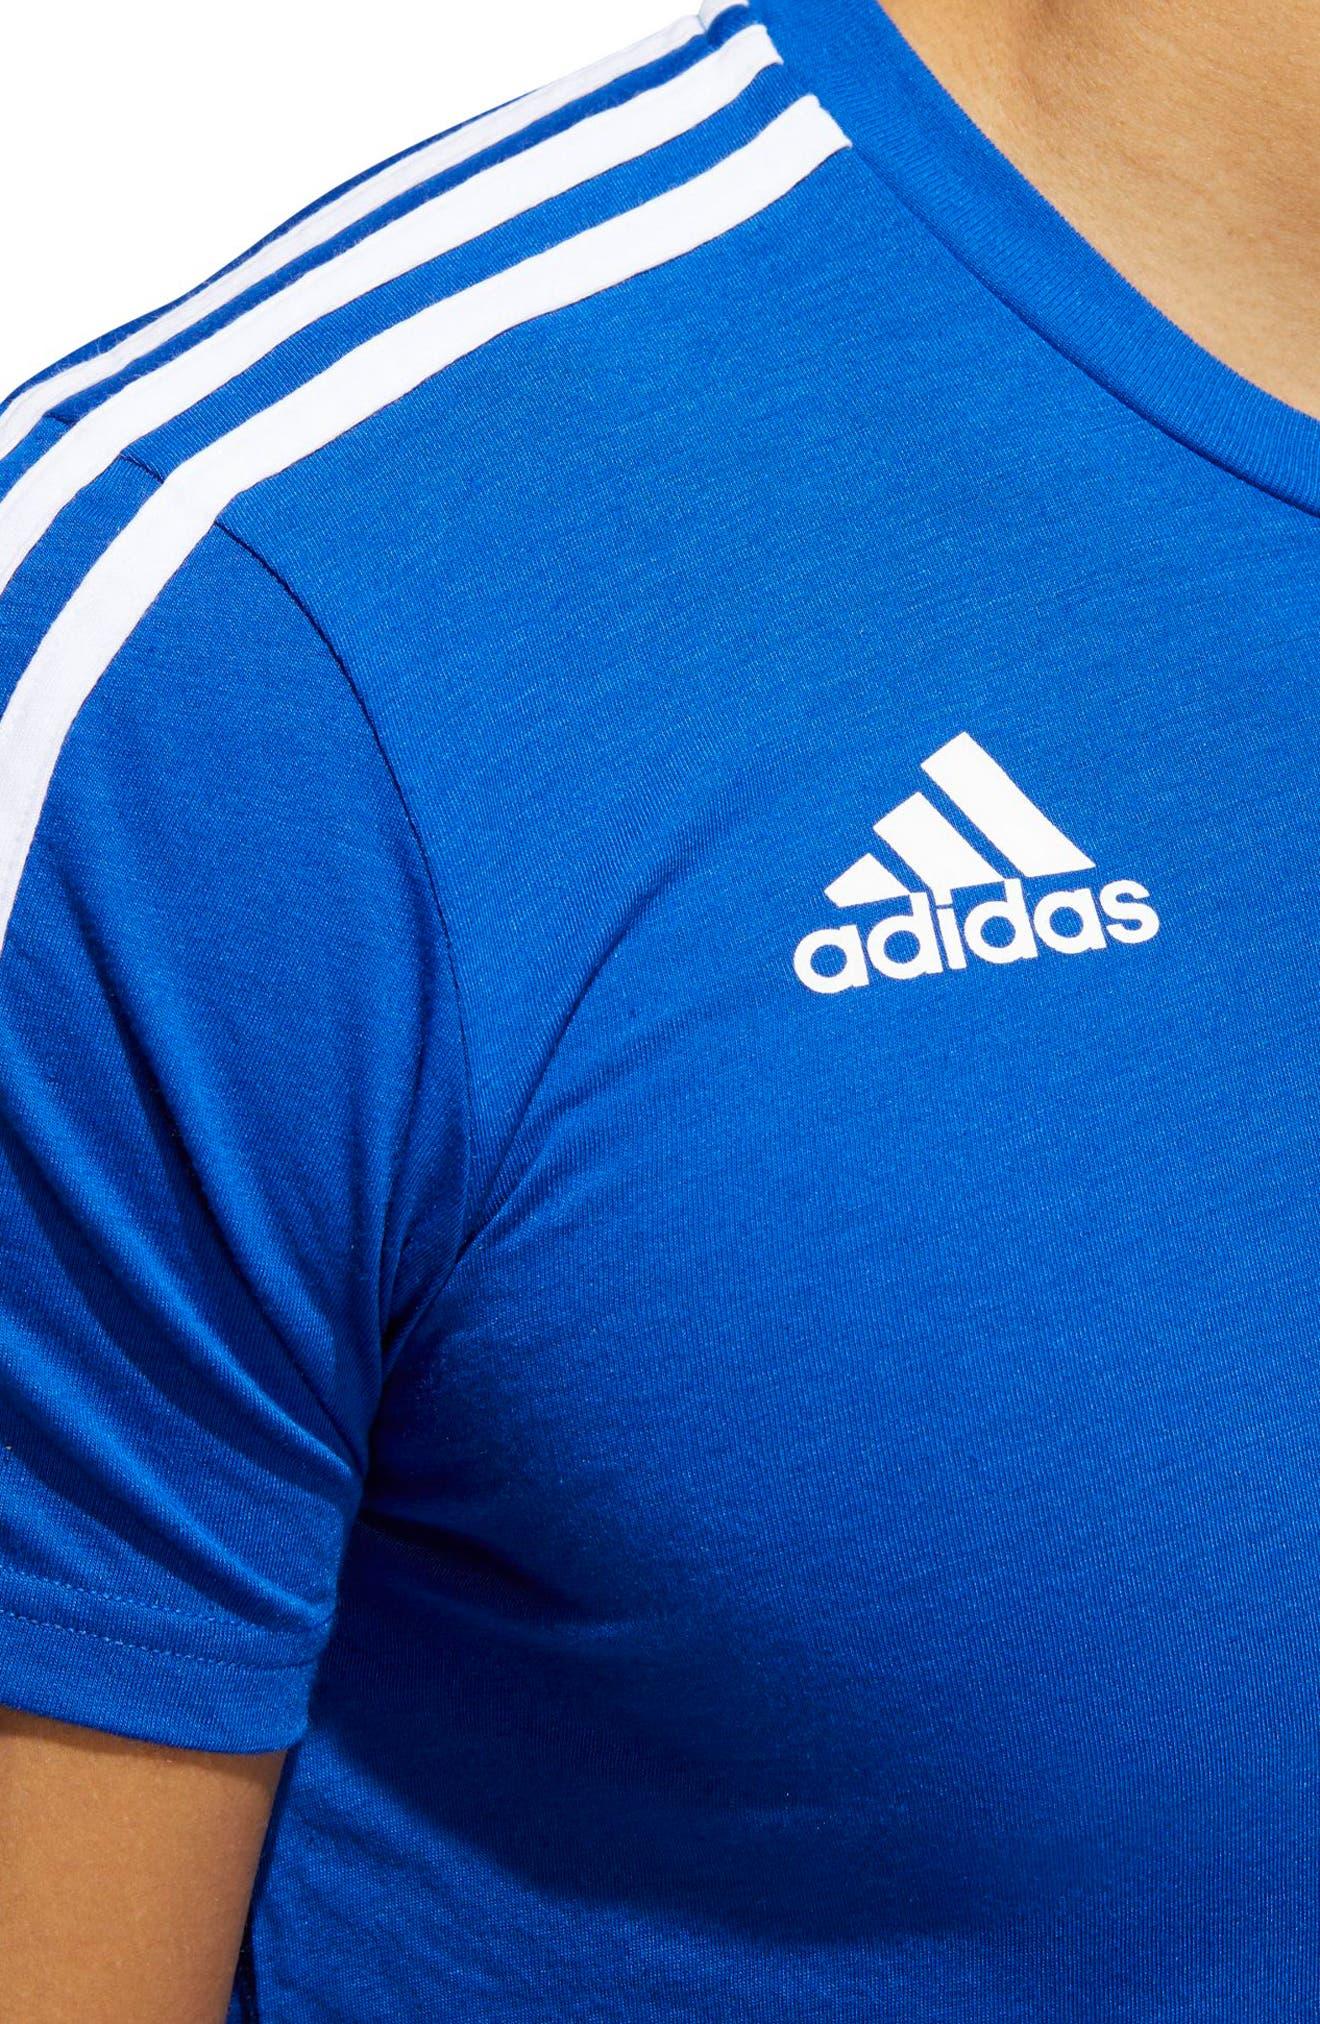 Soccer Slim Fit T-Shirt,                             Alternate thumbnail 10, color,